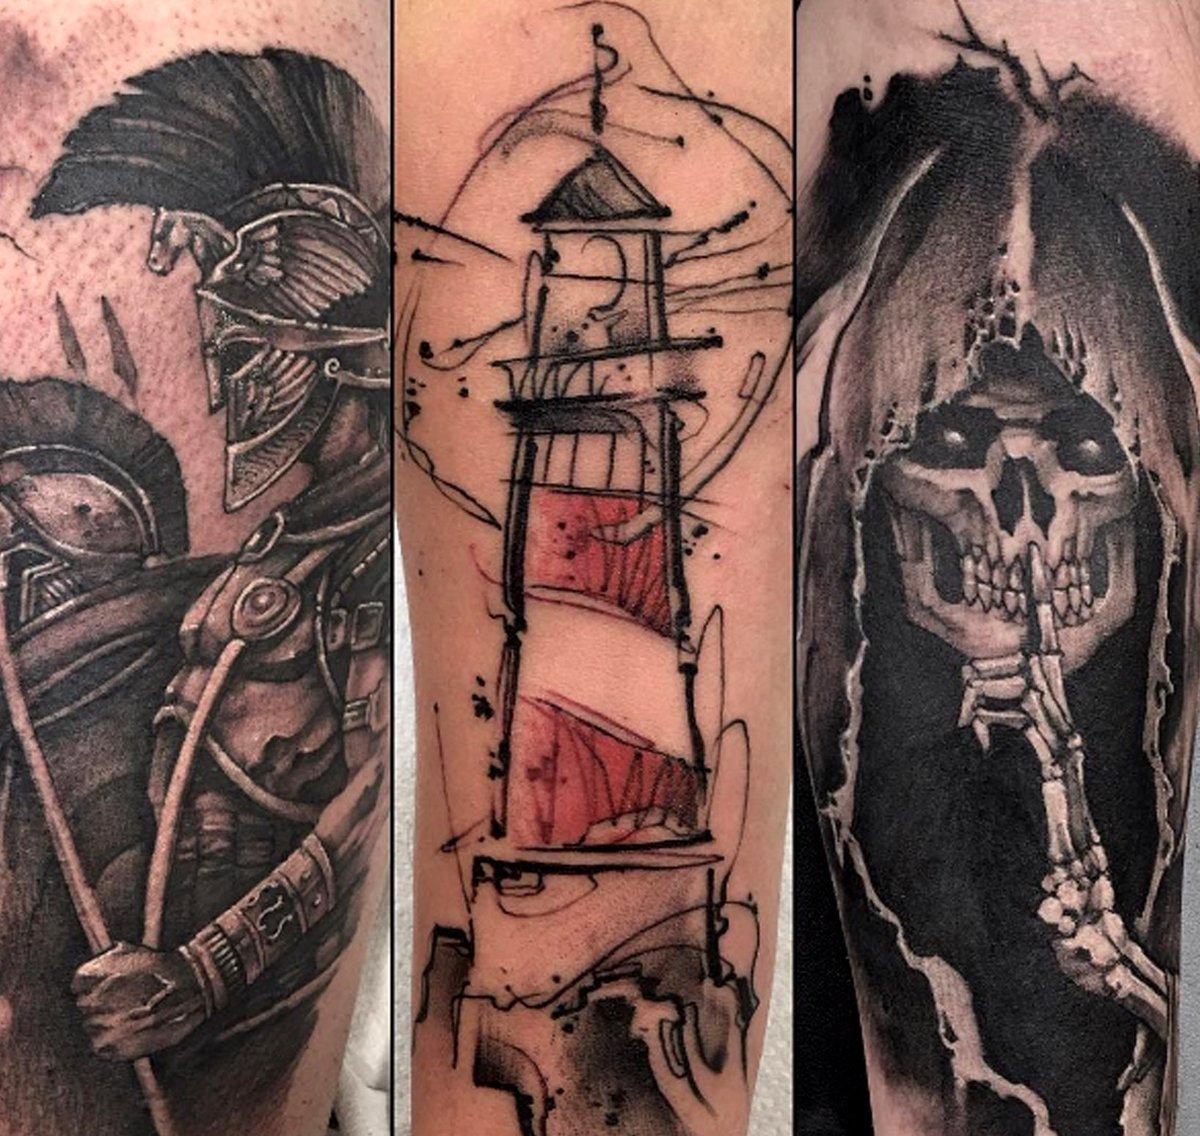 Pura Vida Tatuajes On Twitter Tattoo By At Juanlopeztattoo Muerte